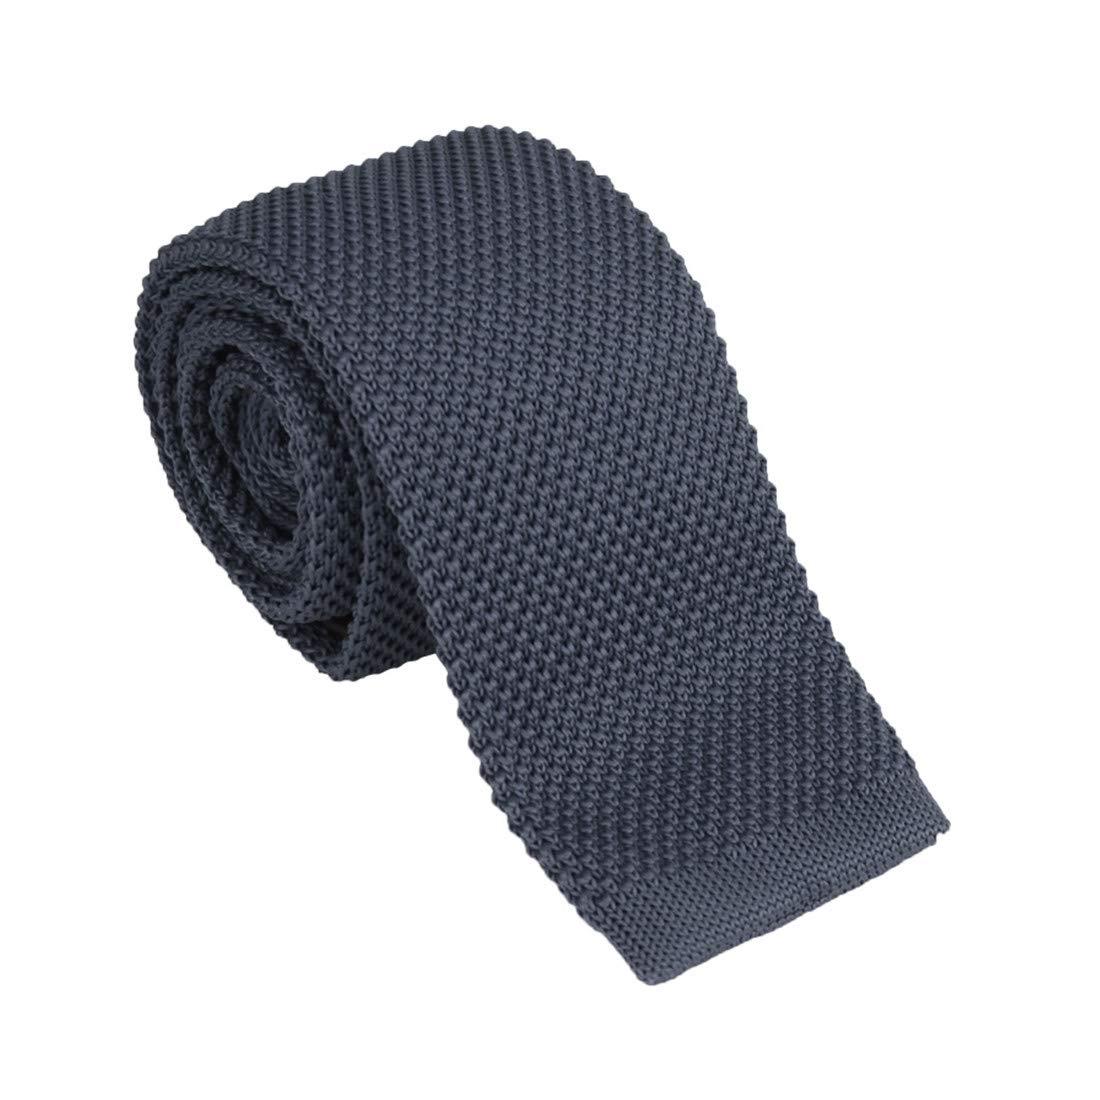 "Dan Smith Skinny Knit Tie For Men Vintage Smart Casual 2/"" Mens Skinny Knit Neck Tie Solid Ties Various Colors"